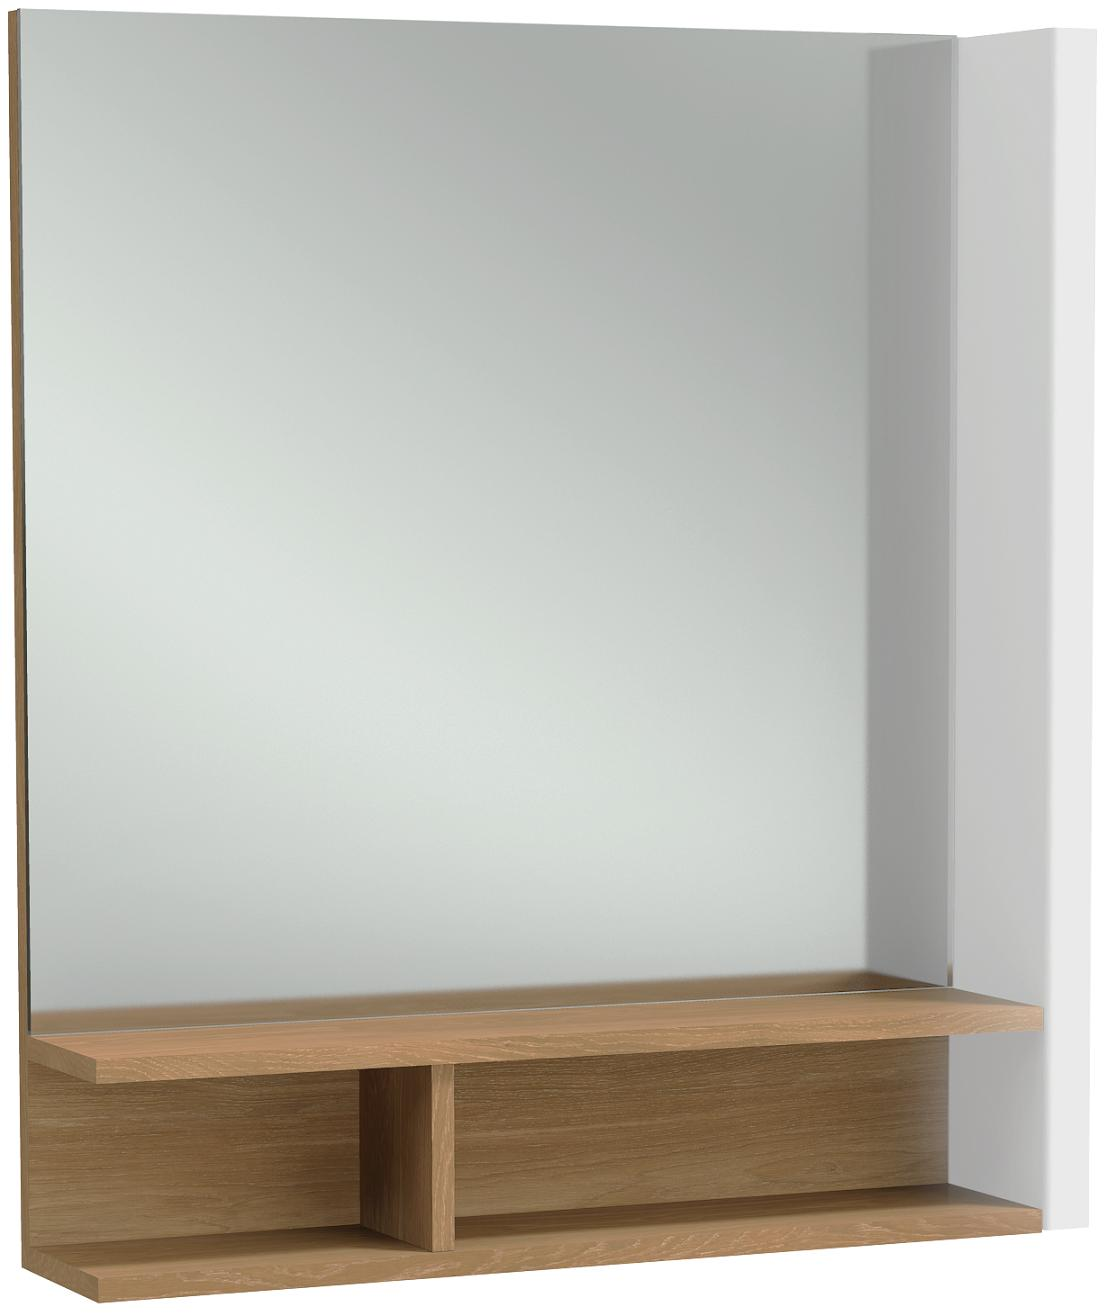 Зеркало Jacob delafon Eb1180d-nf terrace